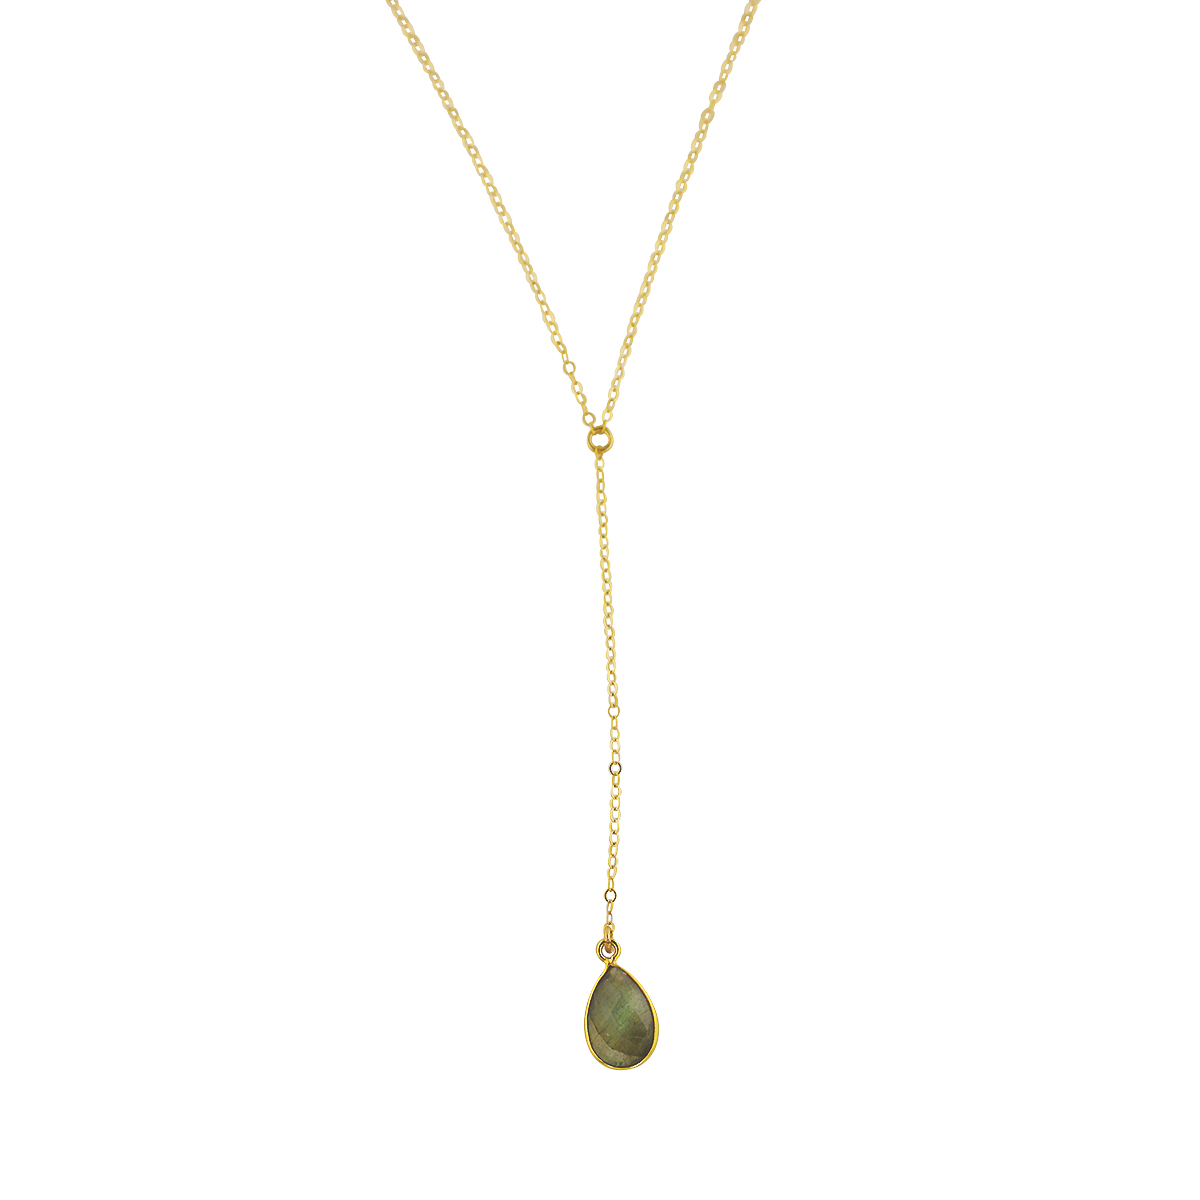 Labradorite Lariat Necklace